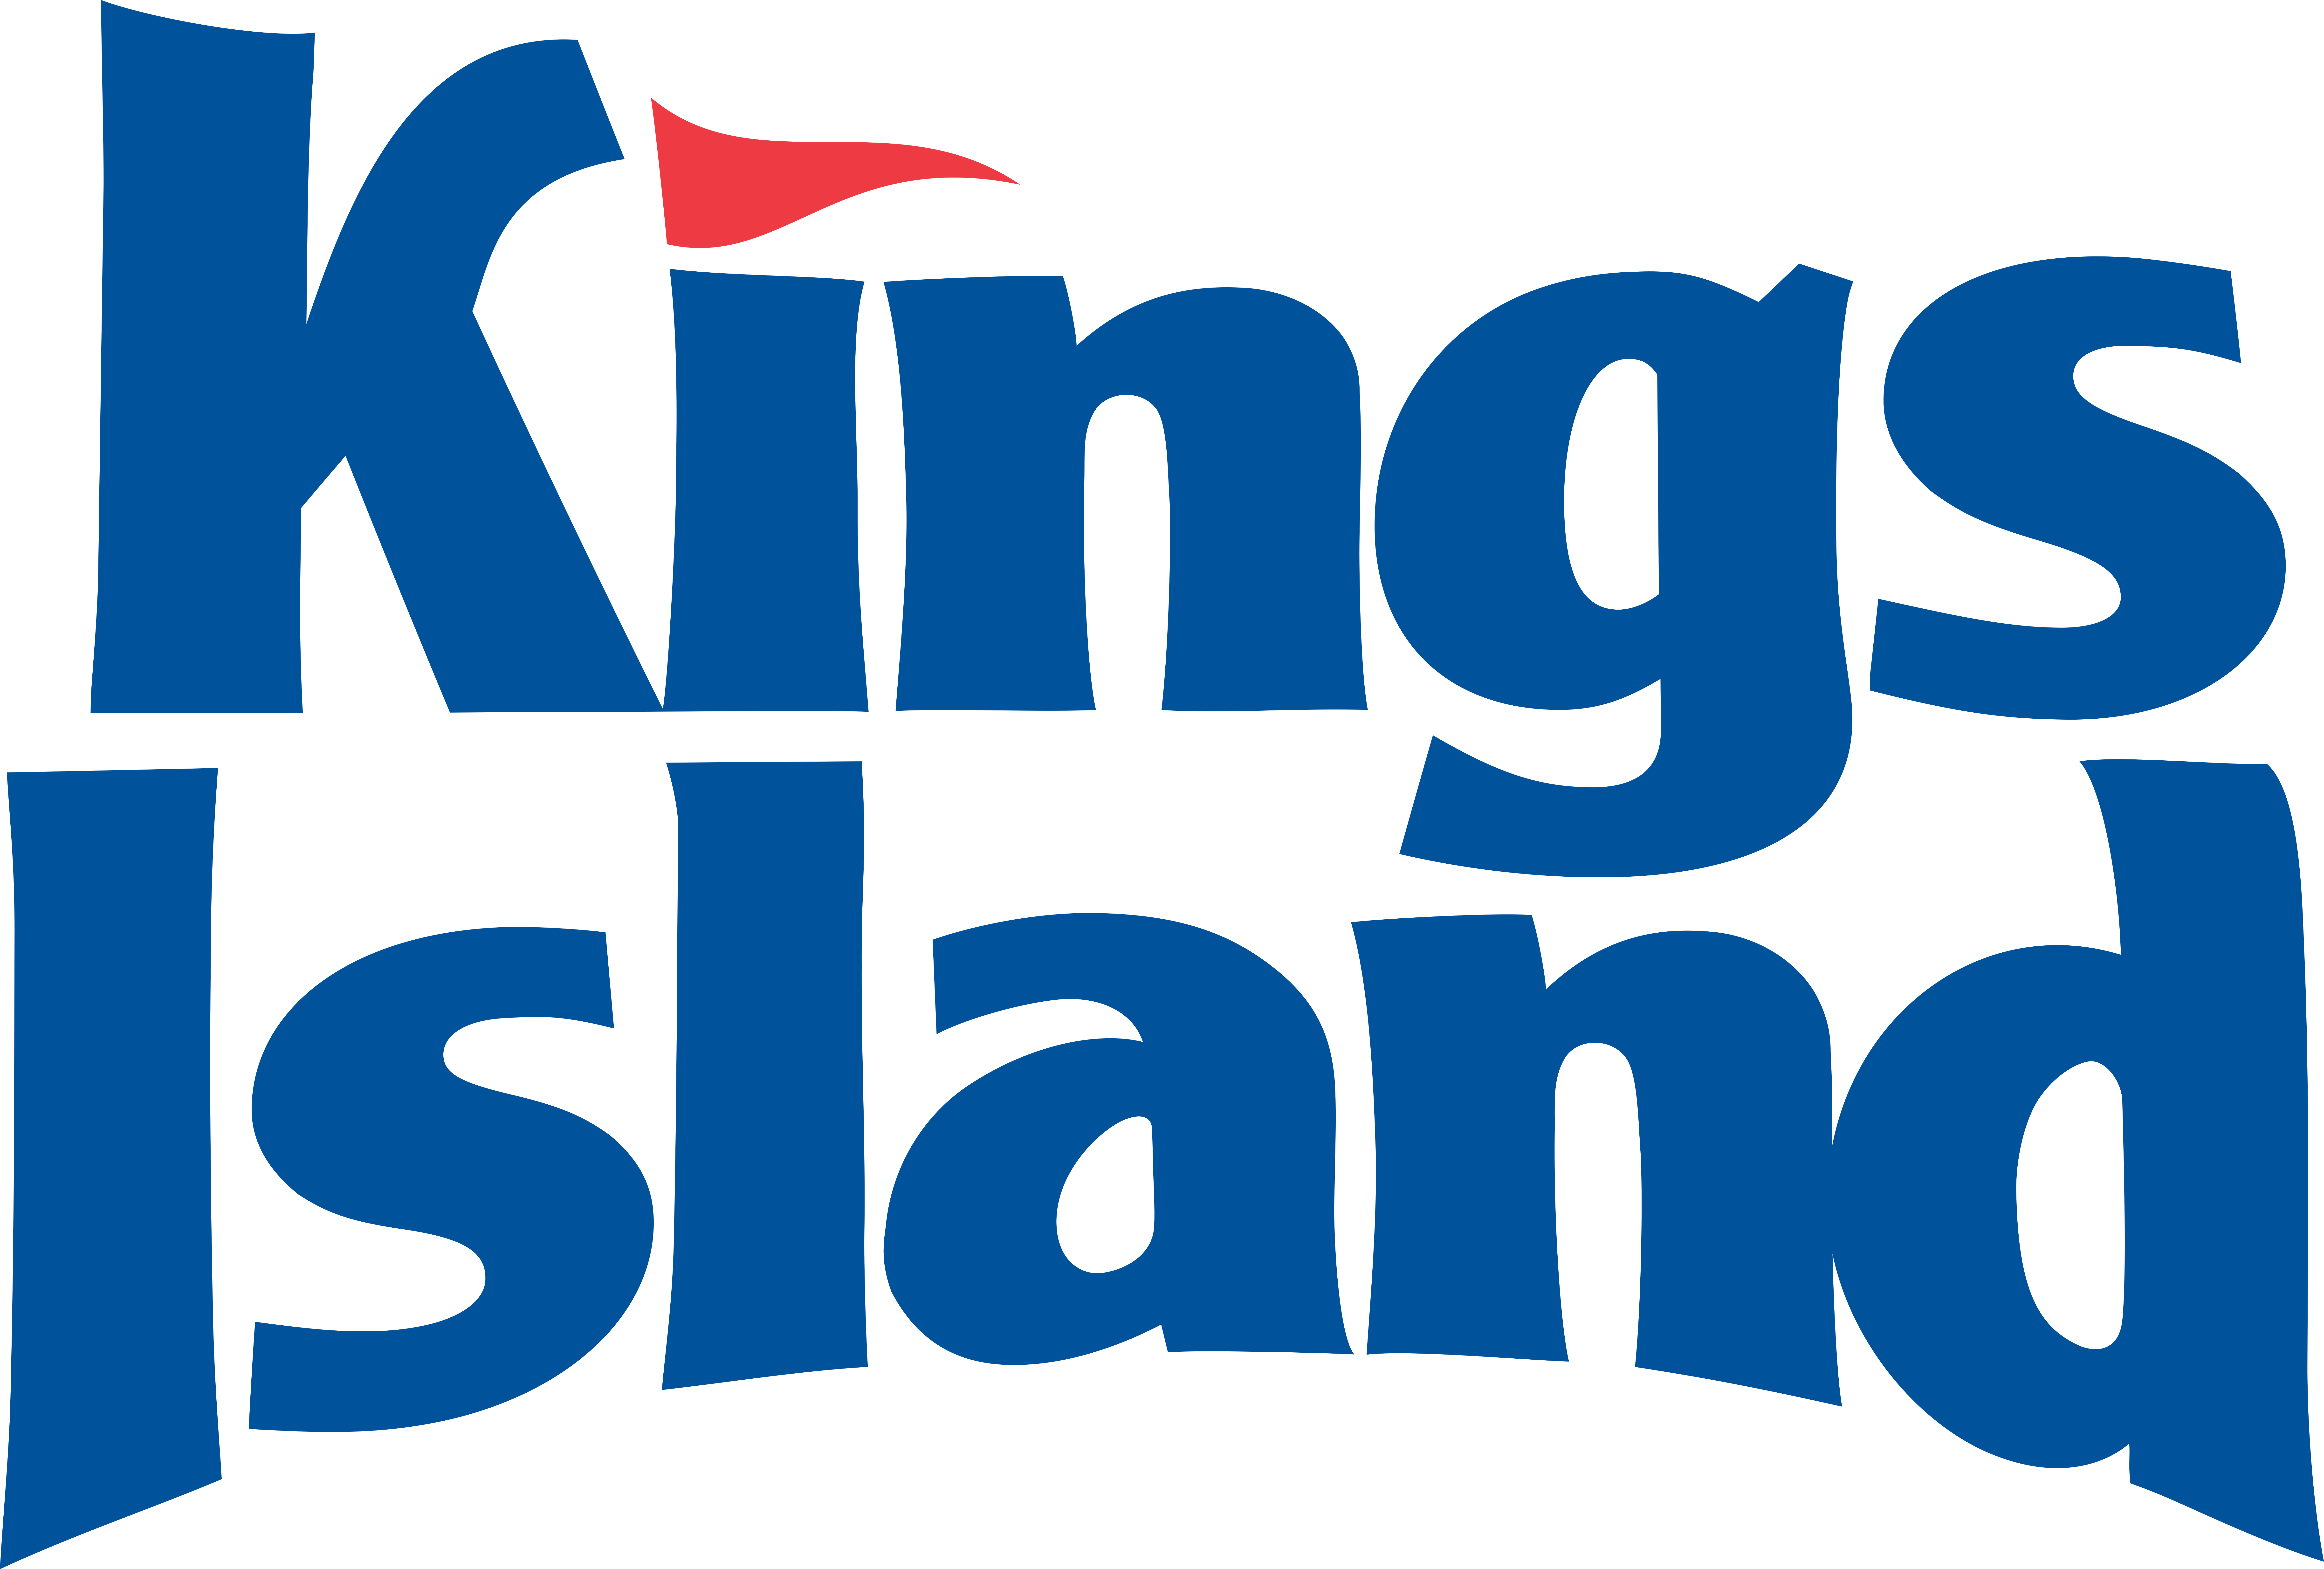 ki-clear-logo